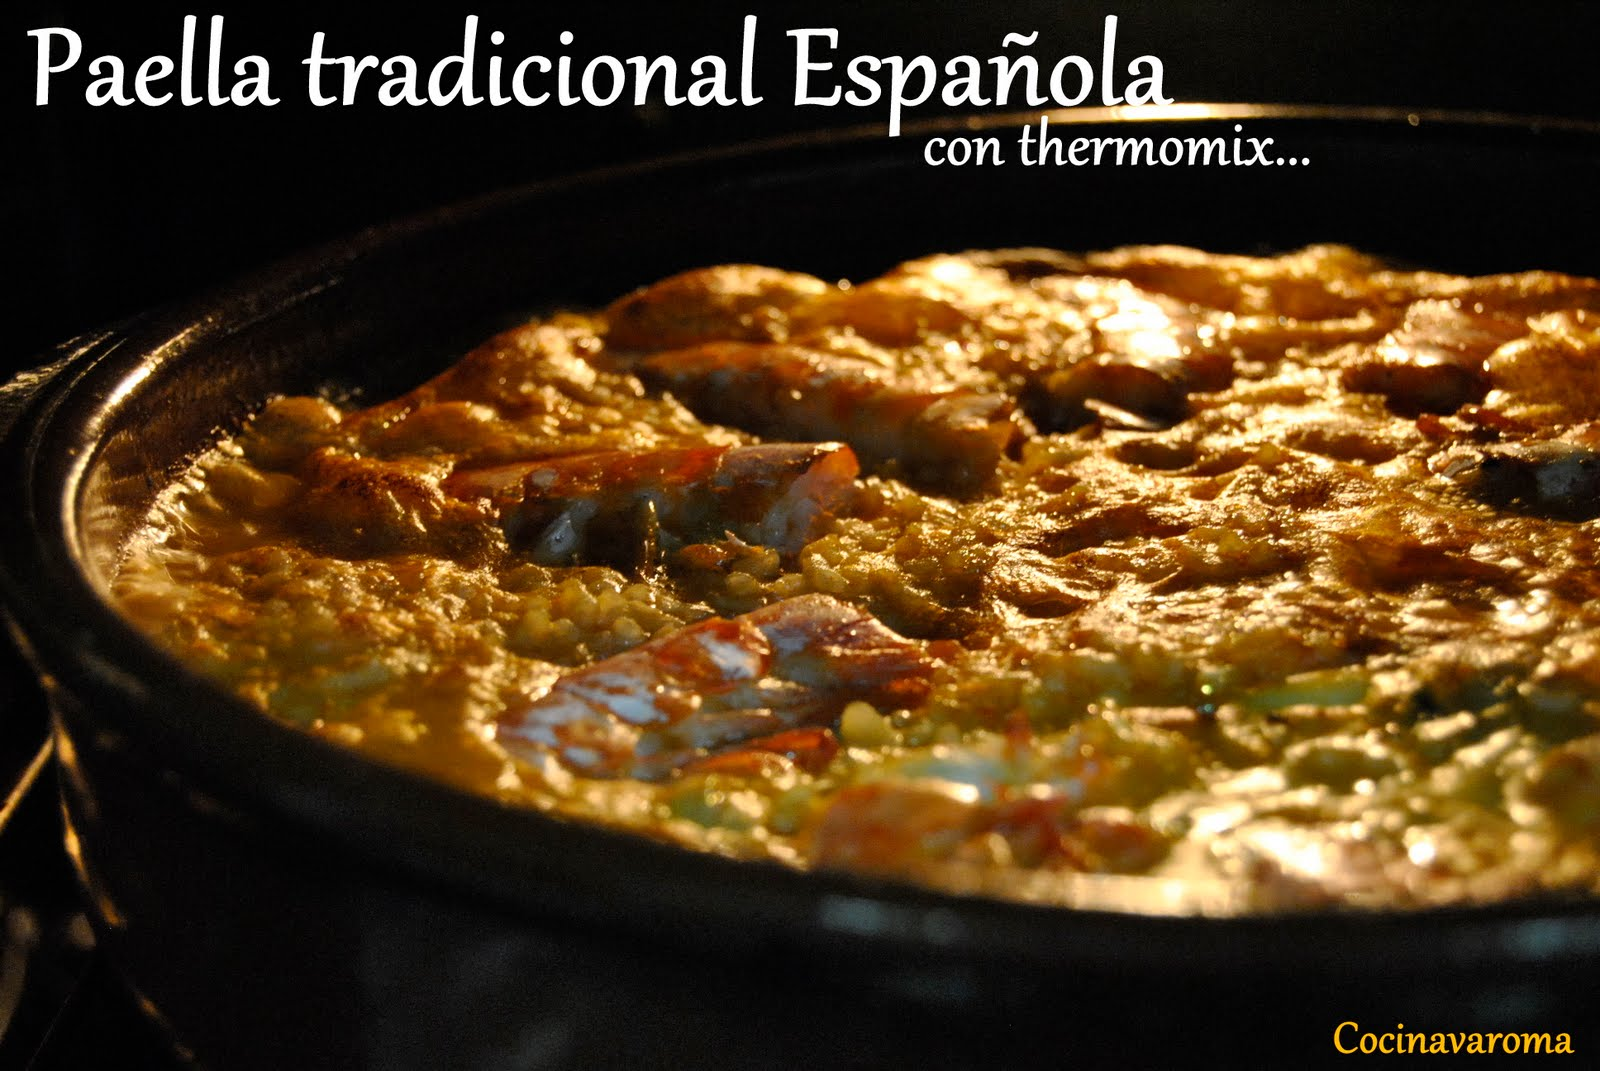 Bonito cocina tradicional espa ola recetas galer a de for Cocina tradicional espanola